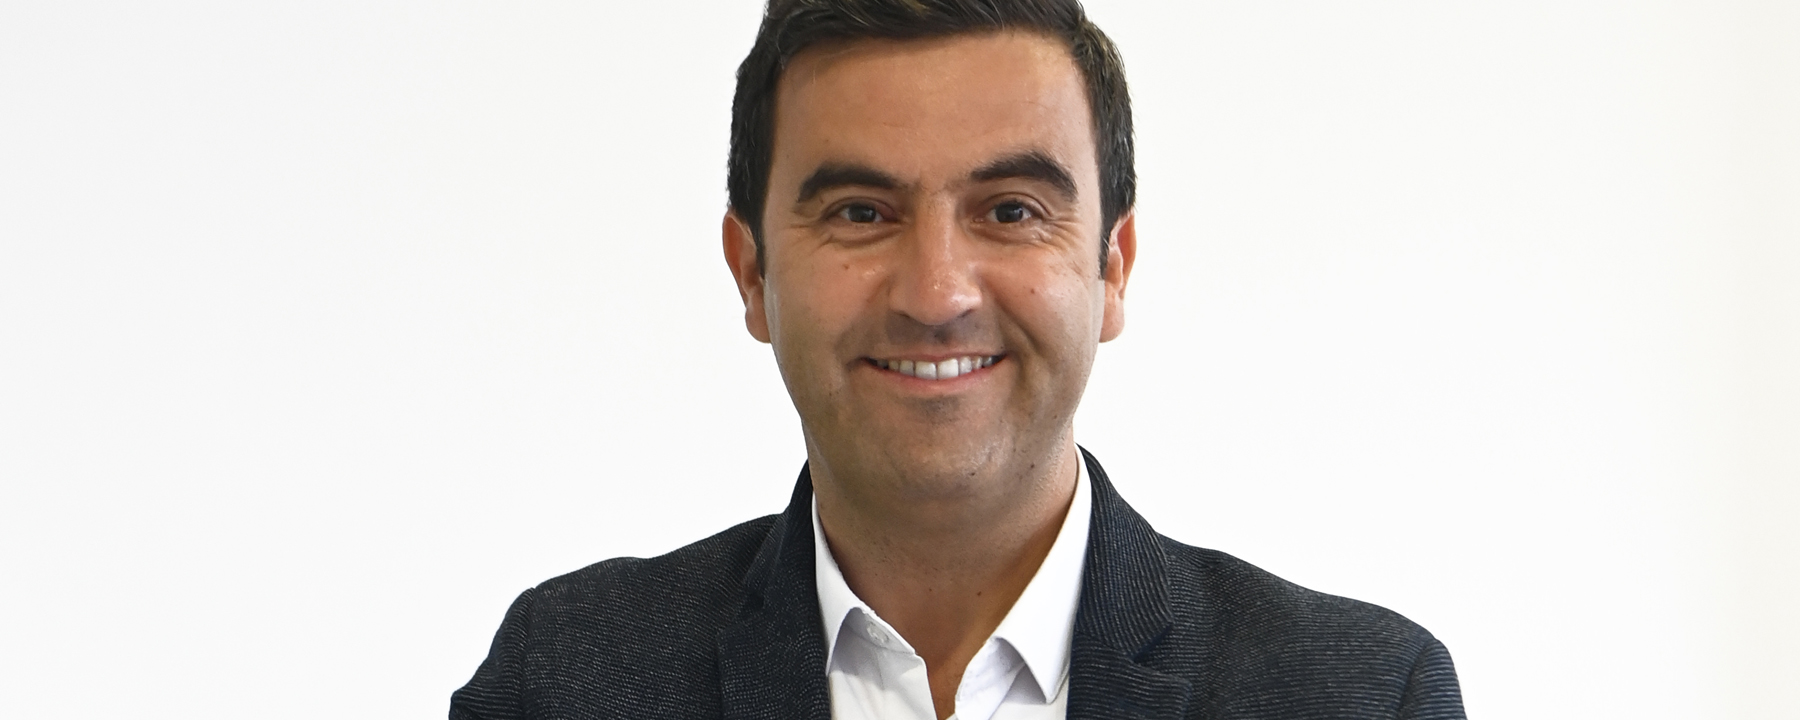 Salim Abdous